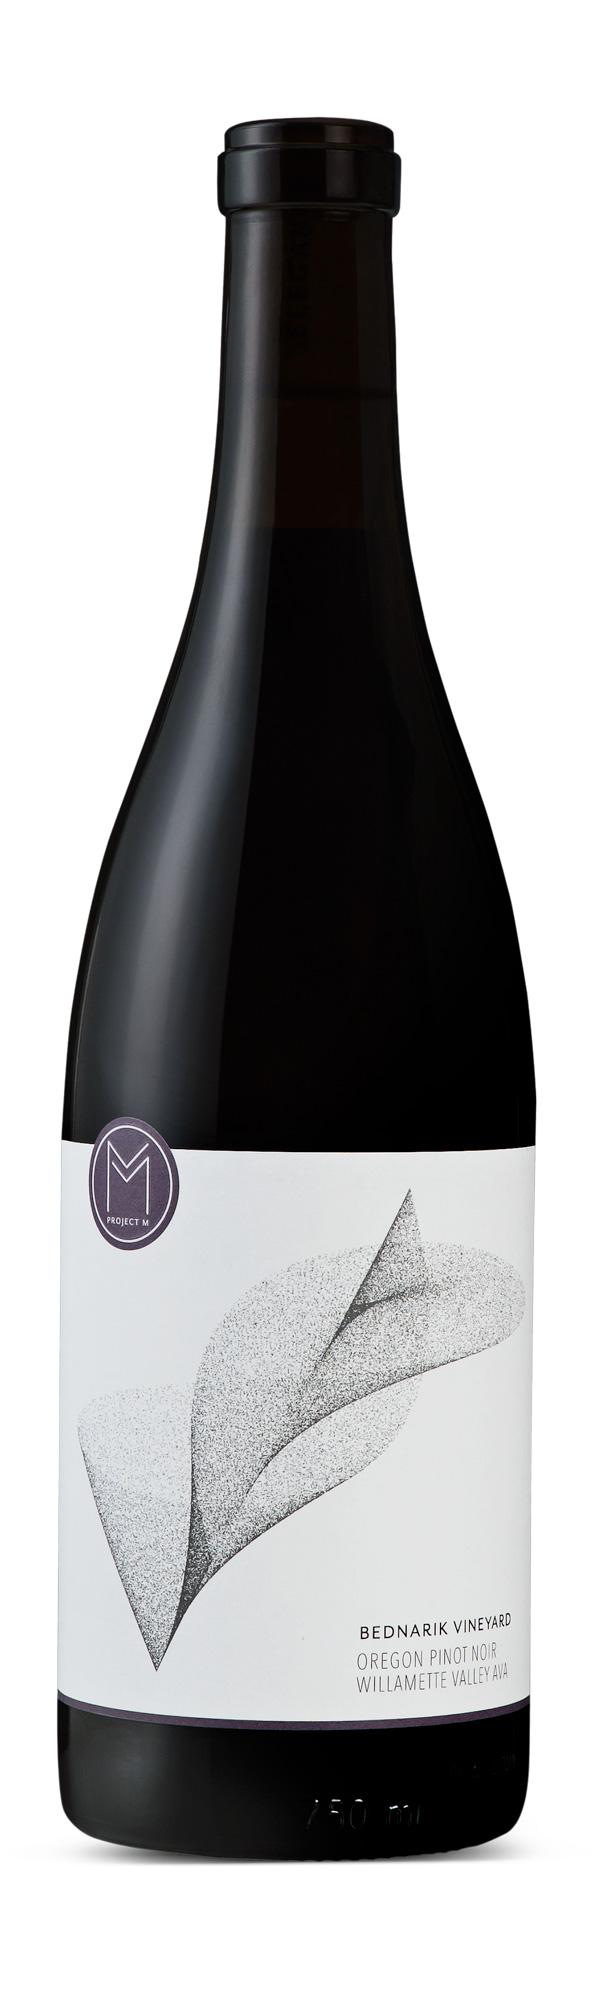 BEDNARIK VINEYARD 2016 Pinot Noir $55